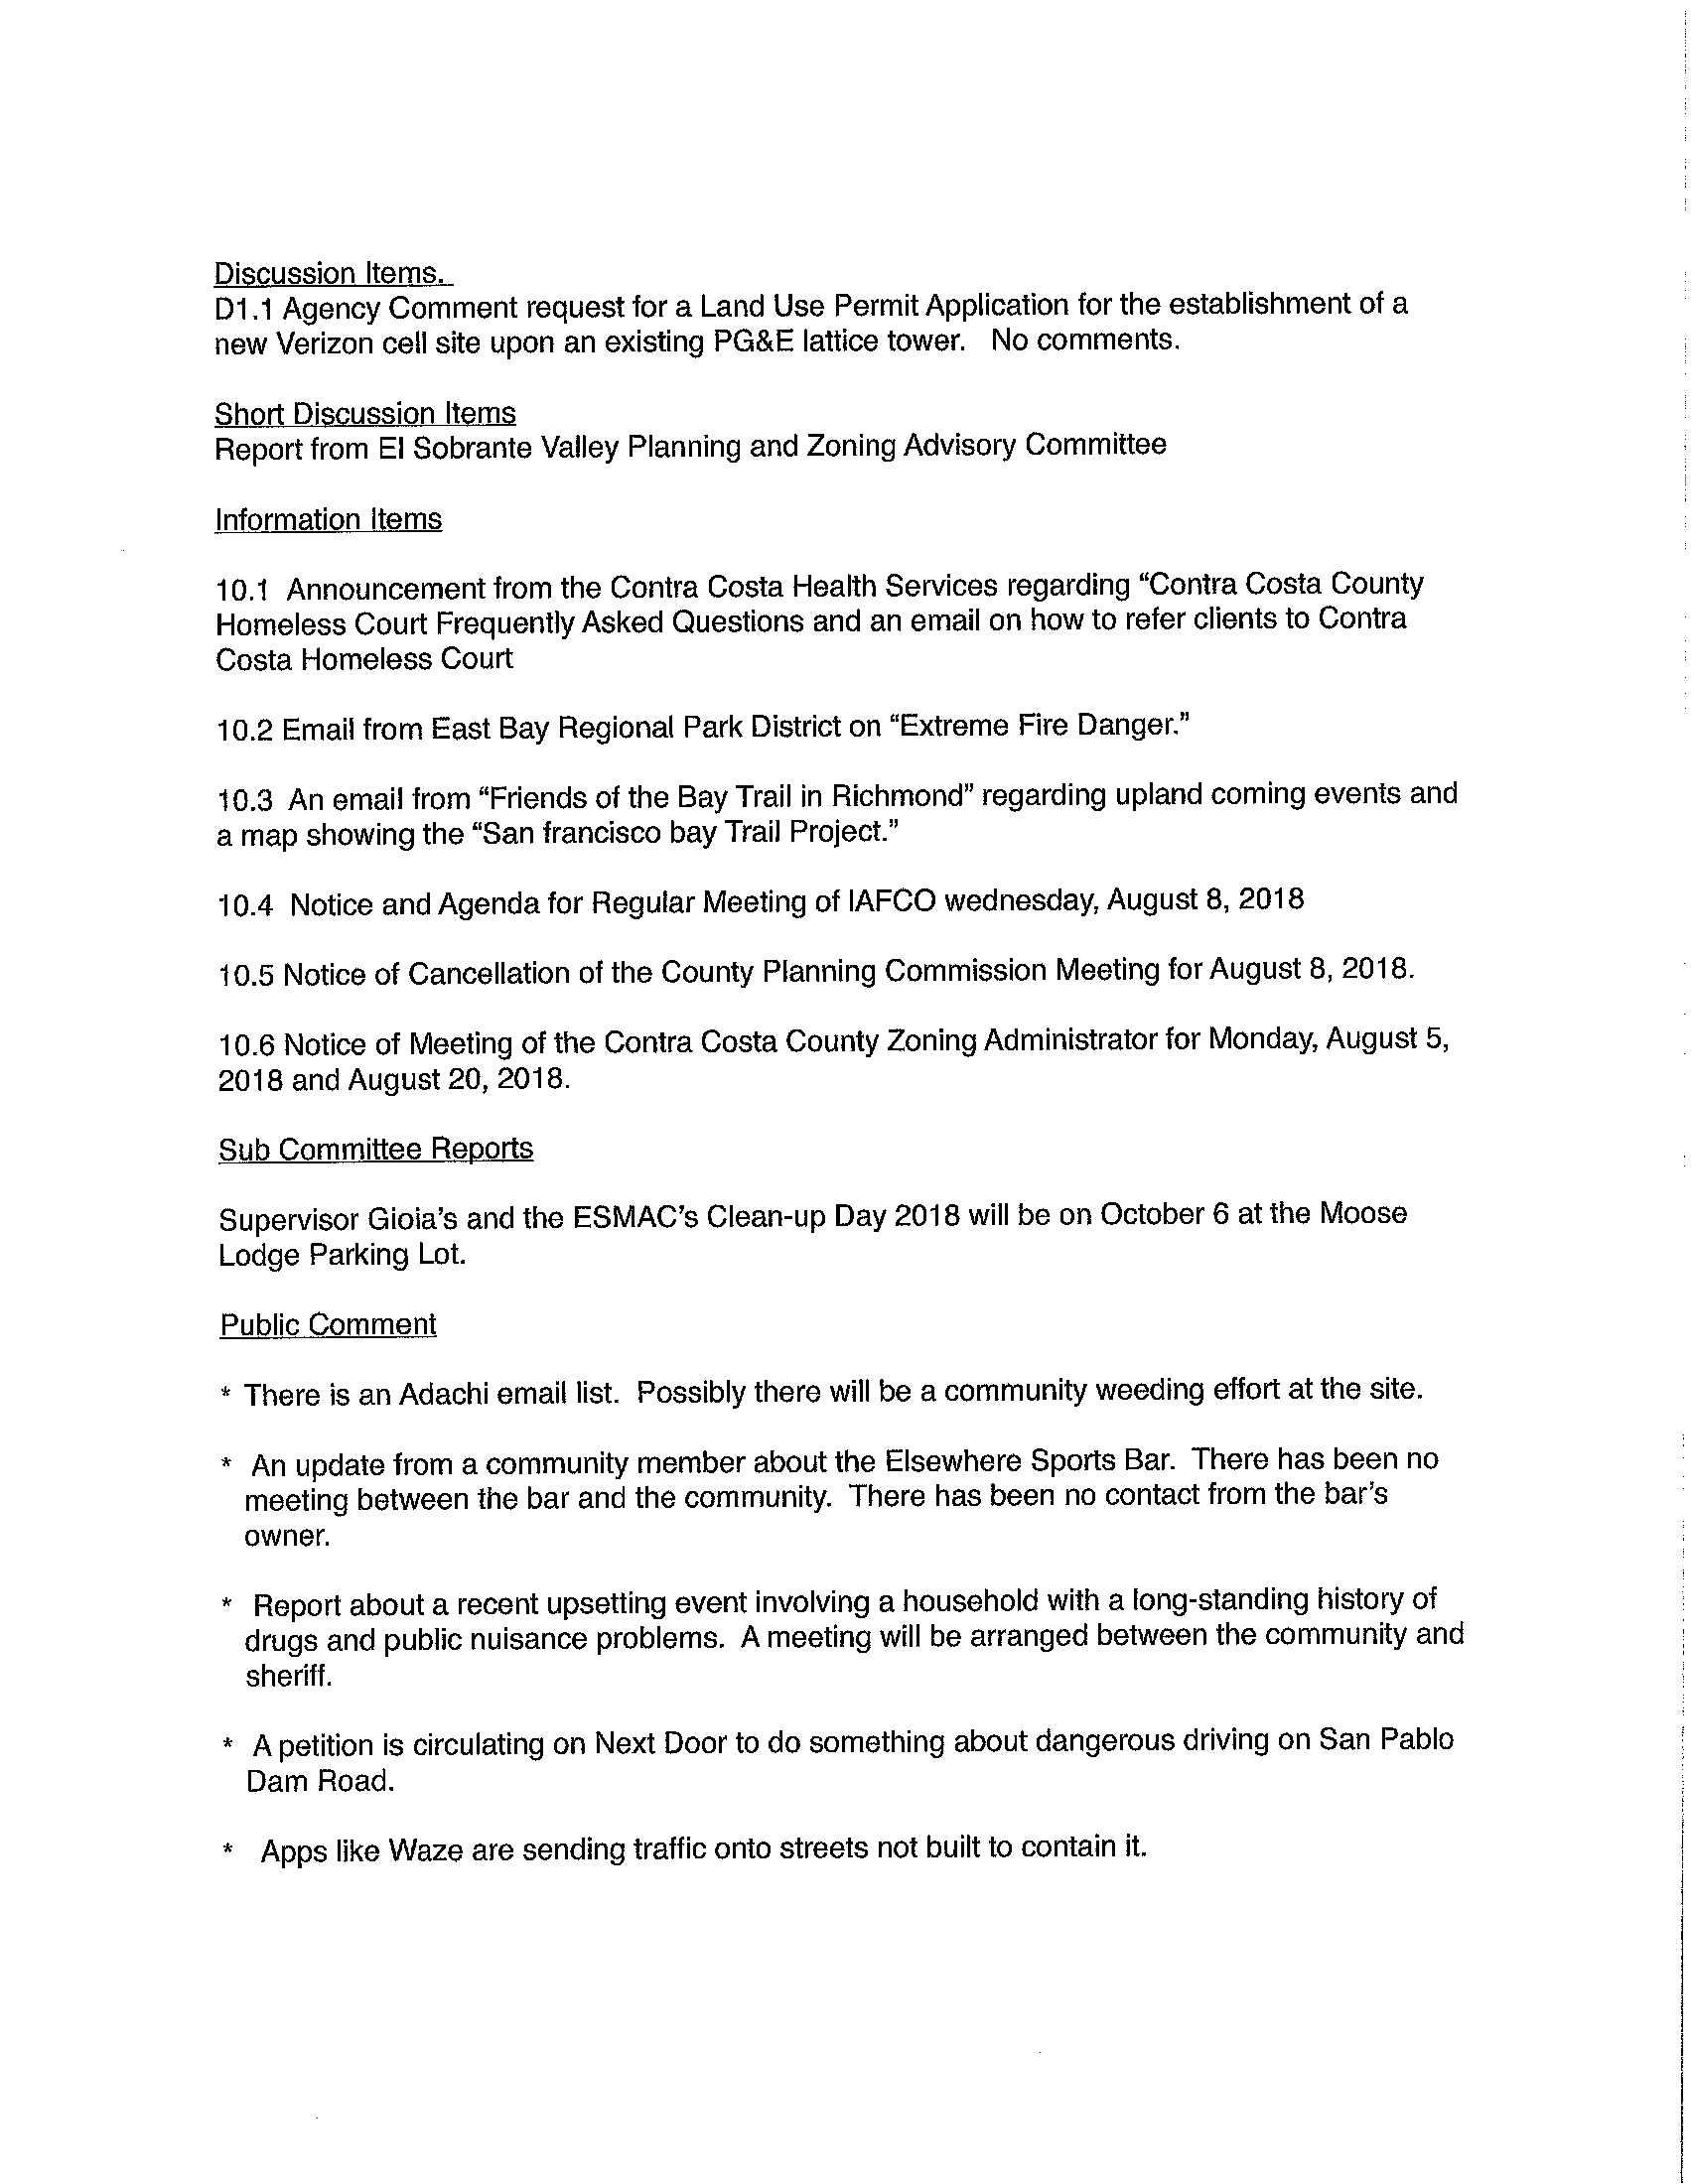 ESMAC Agenda 10.10.2018 (32 Pages)_5.jpg